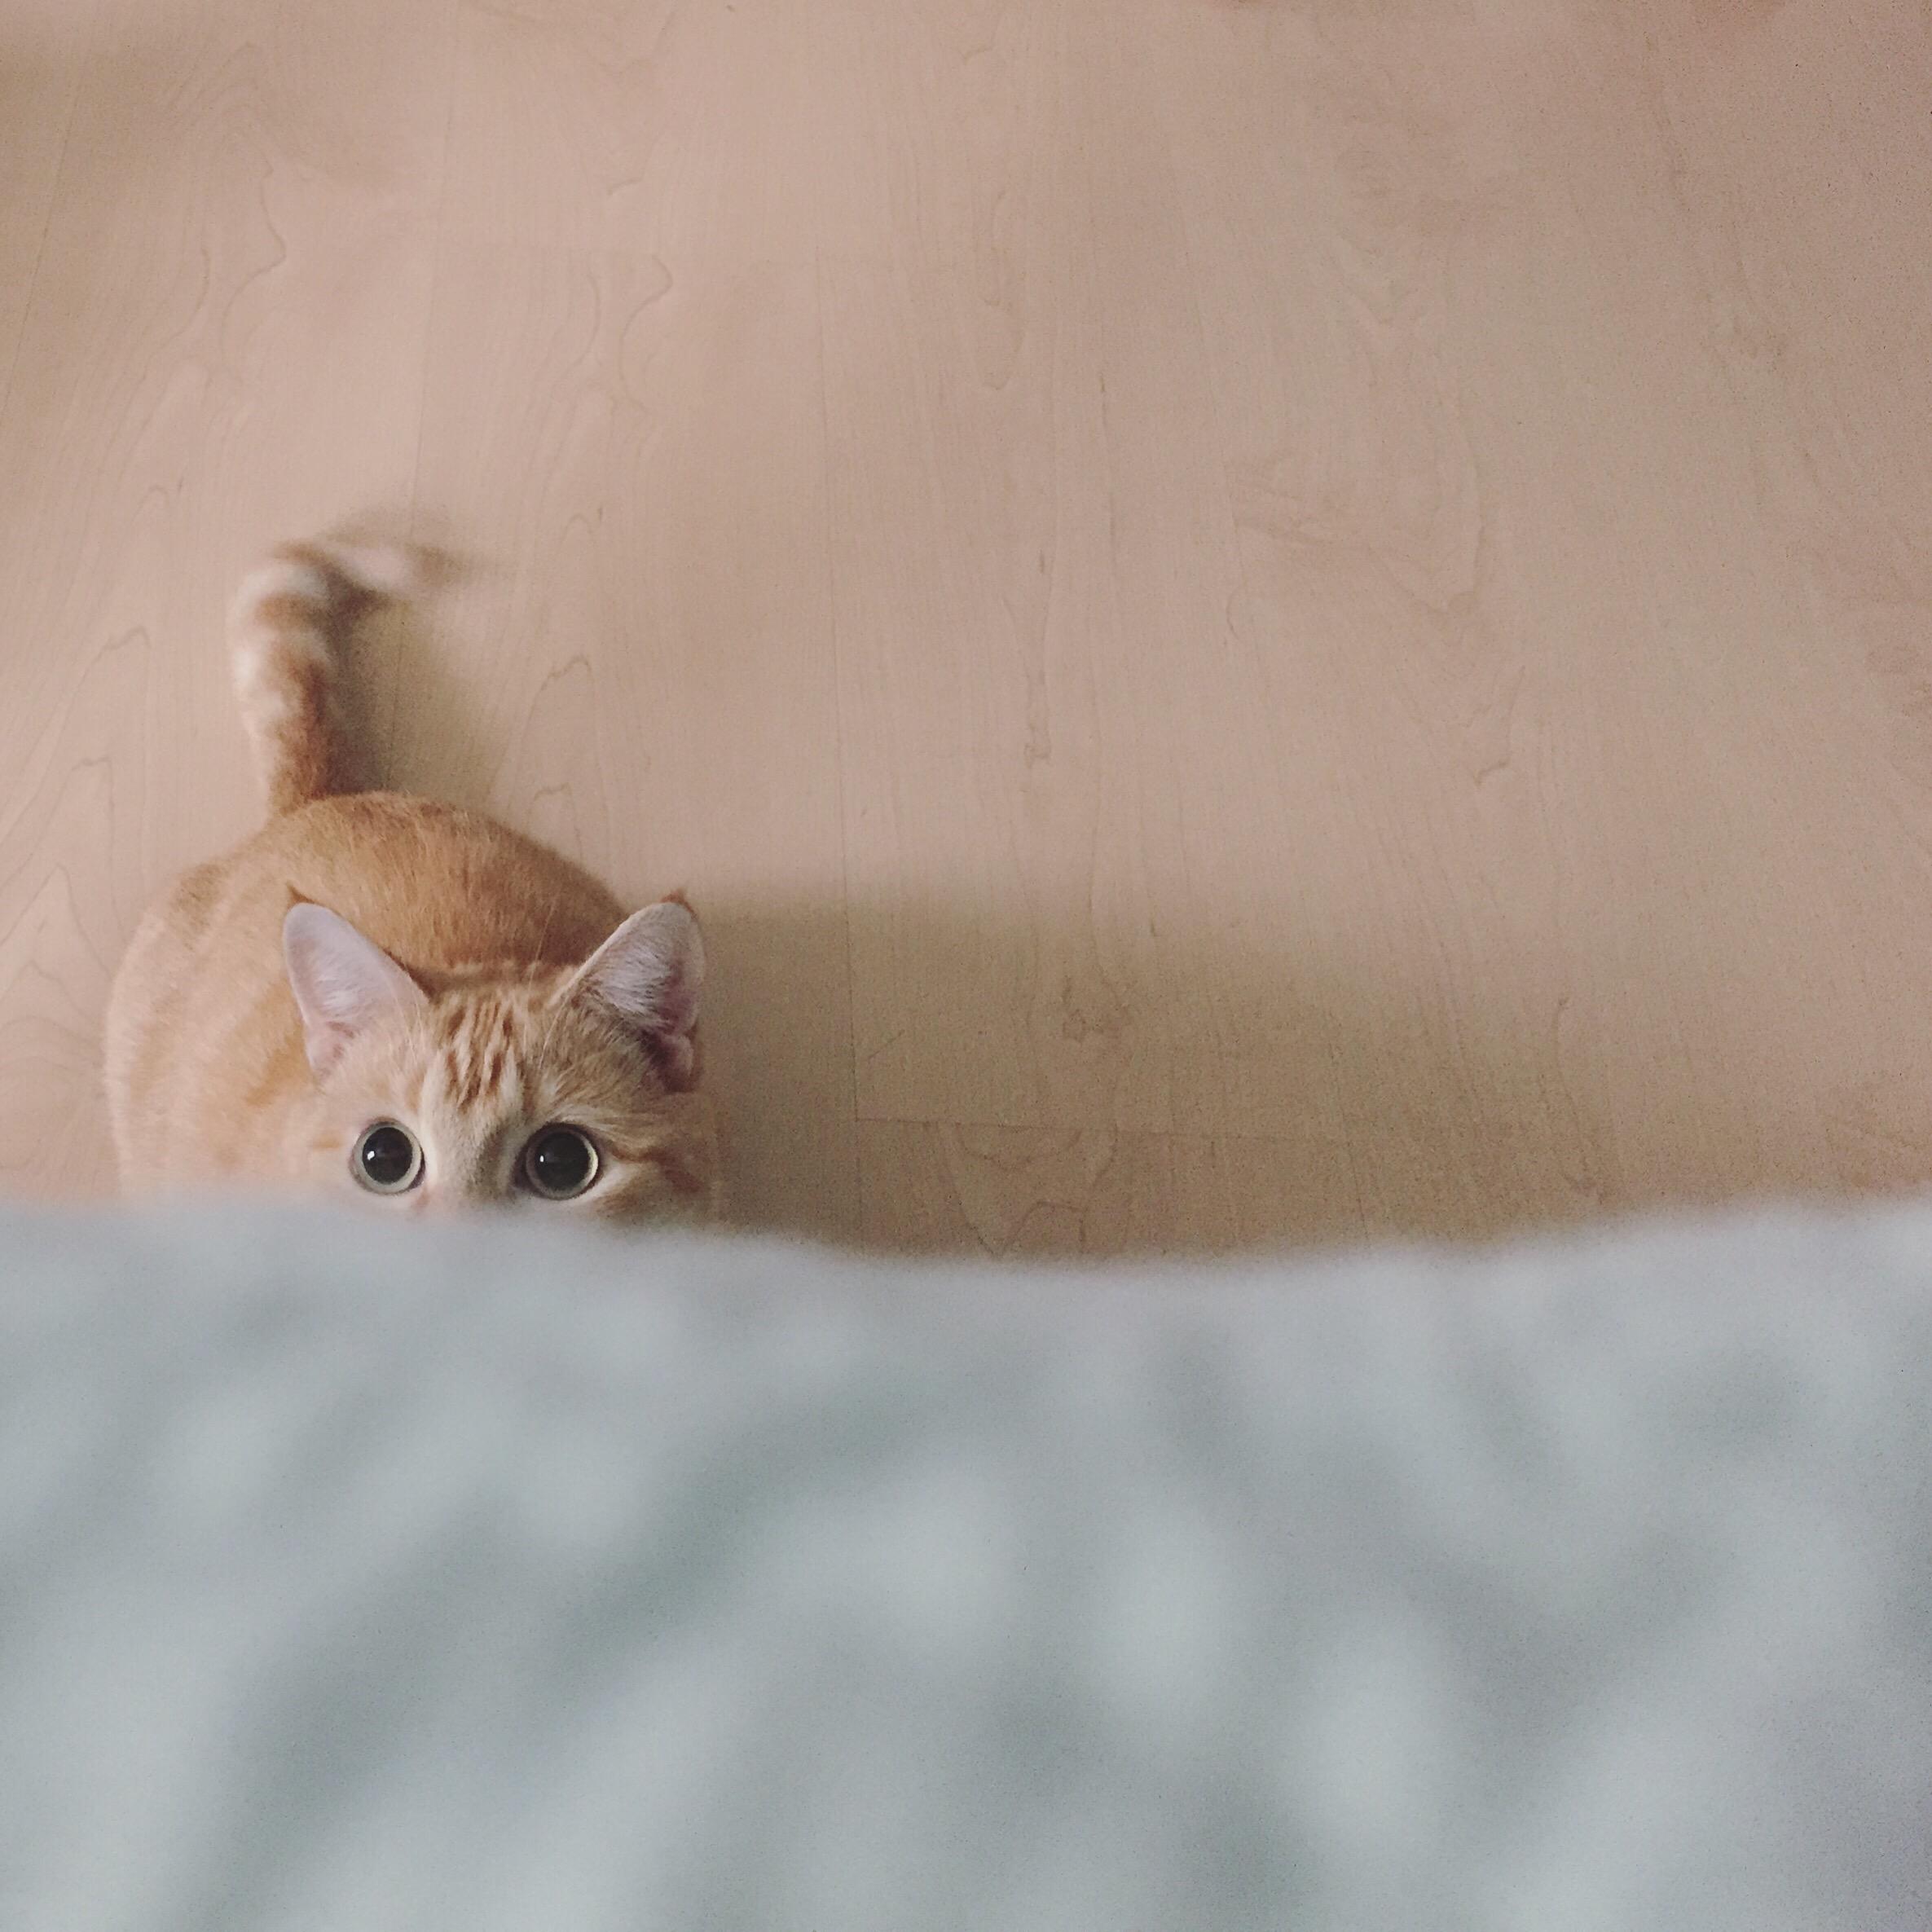 Jak podać kotu tabletkę?